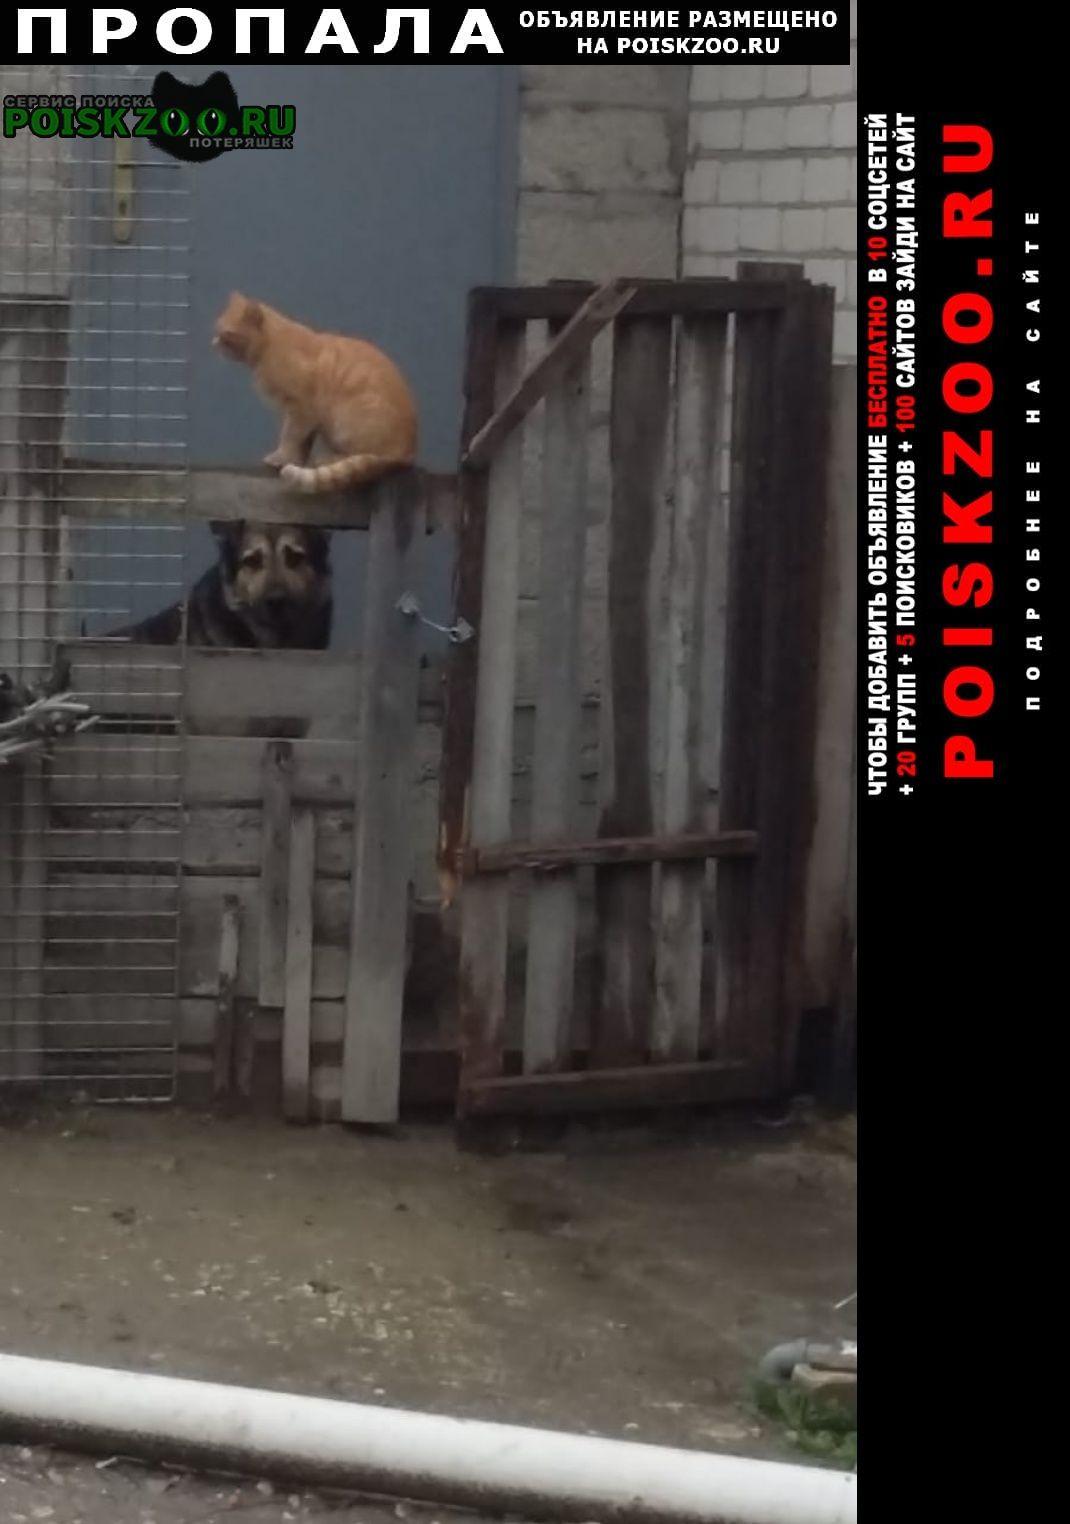 Пропал кот шурик Новороссийск